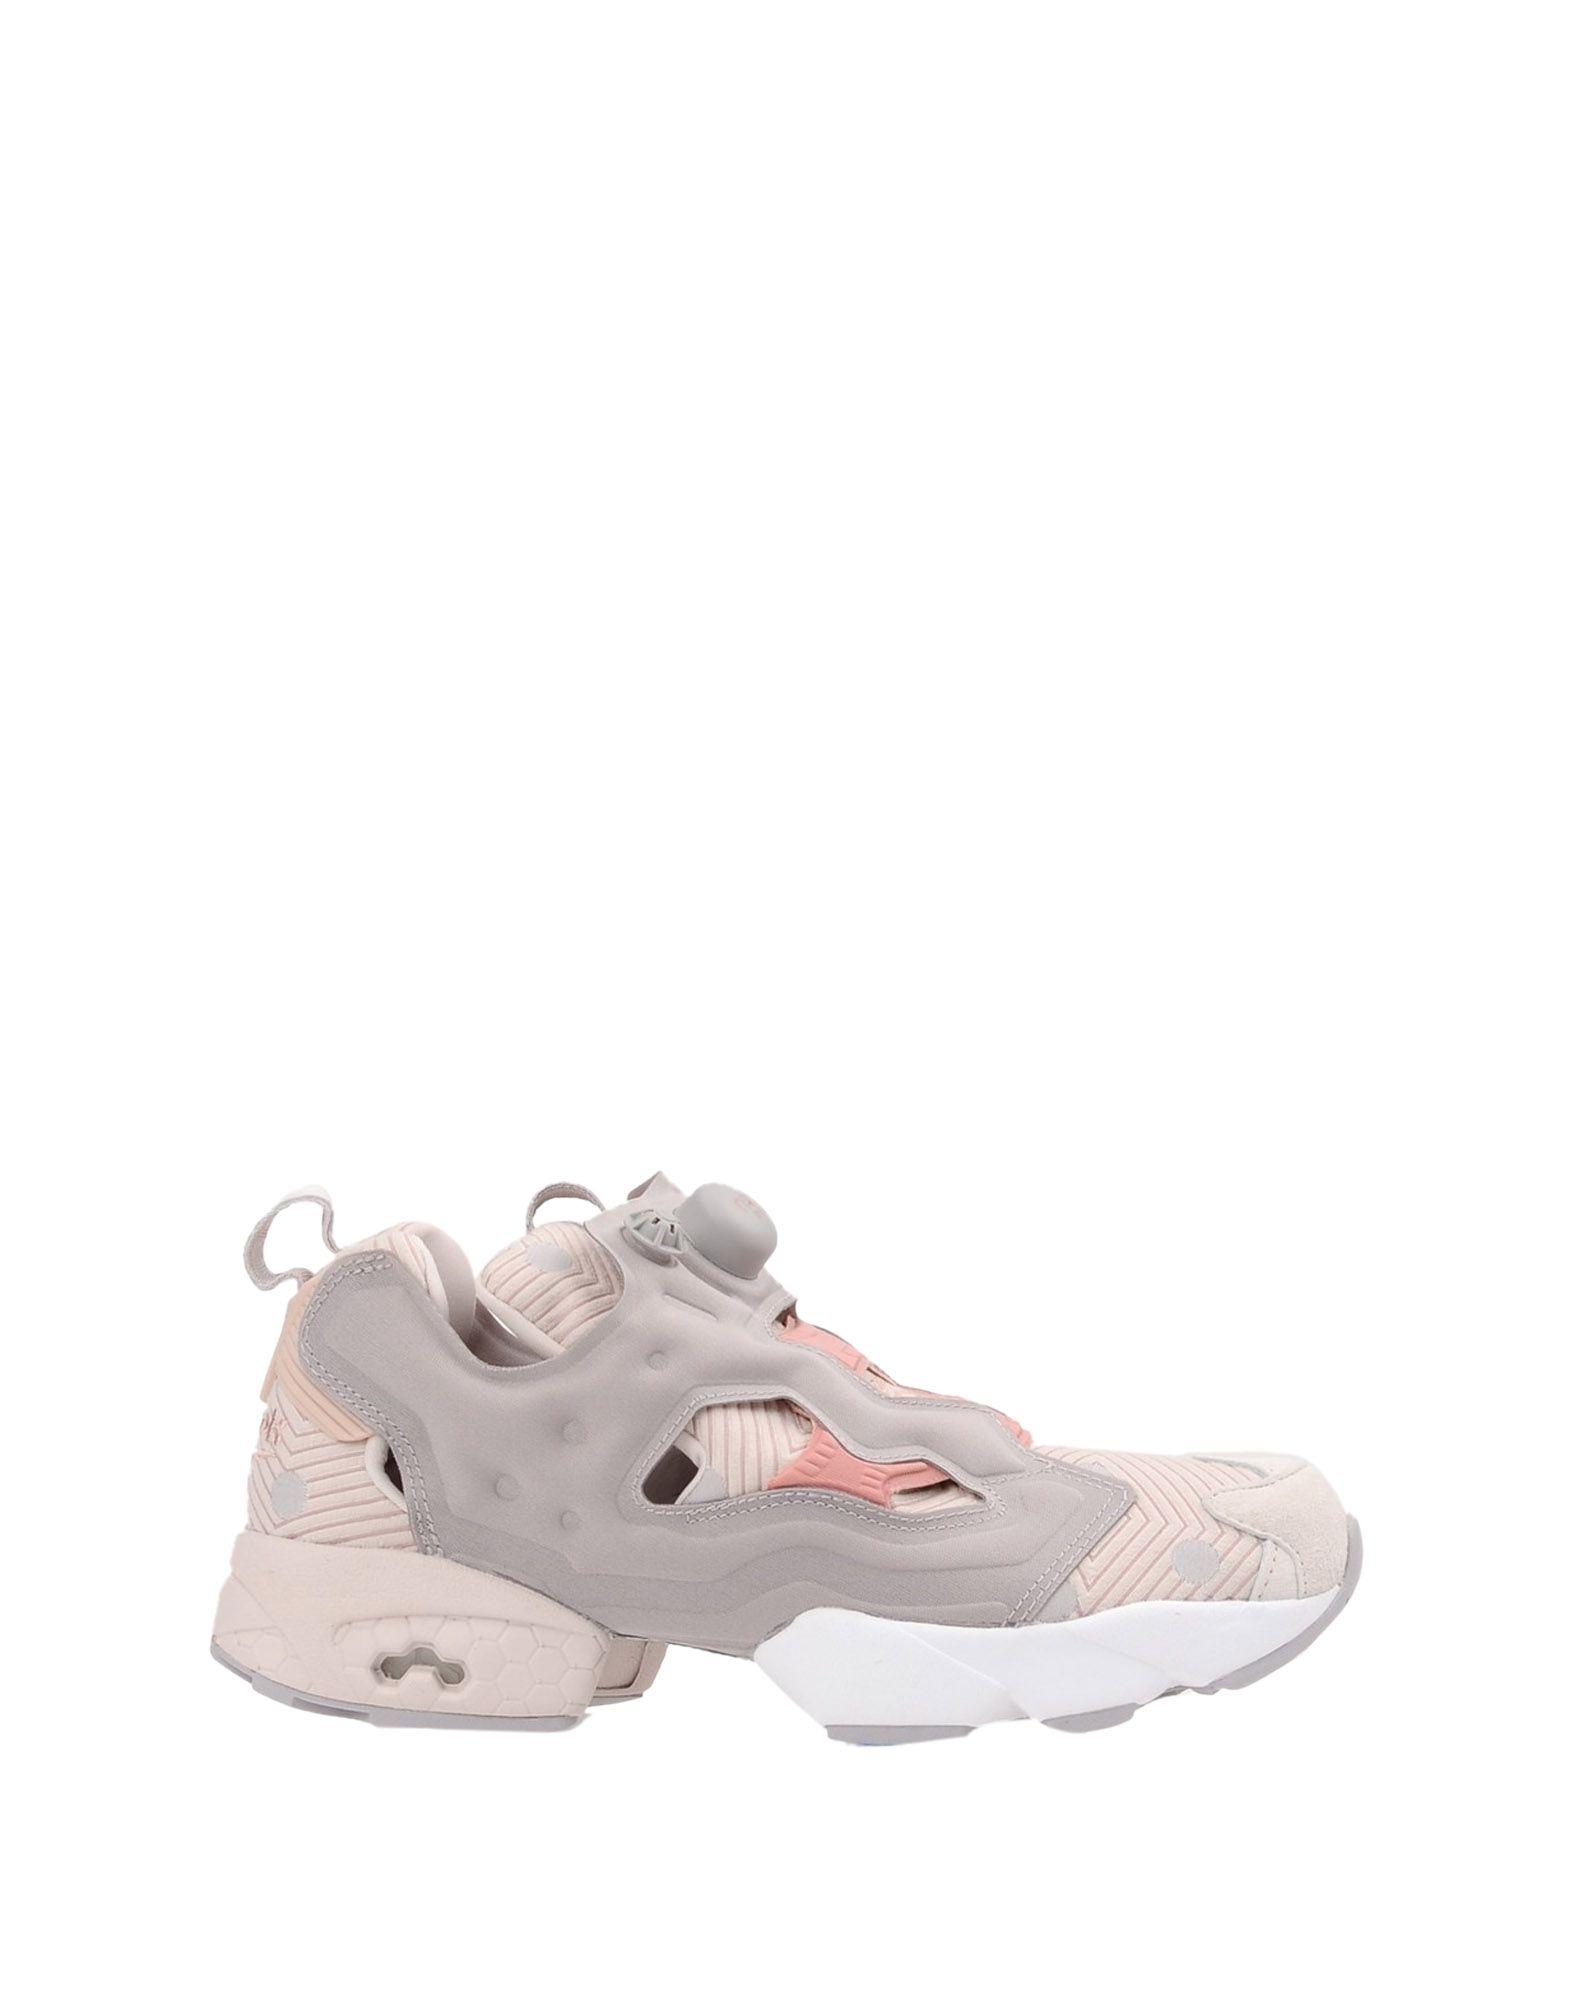 Reebok Instapump aussehende Fury Fbt  11371804XAGut aussehende Instapump strapazierfähige Schuhe 6f635b